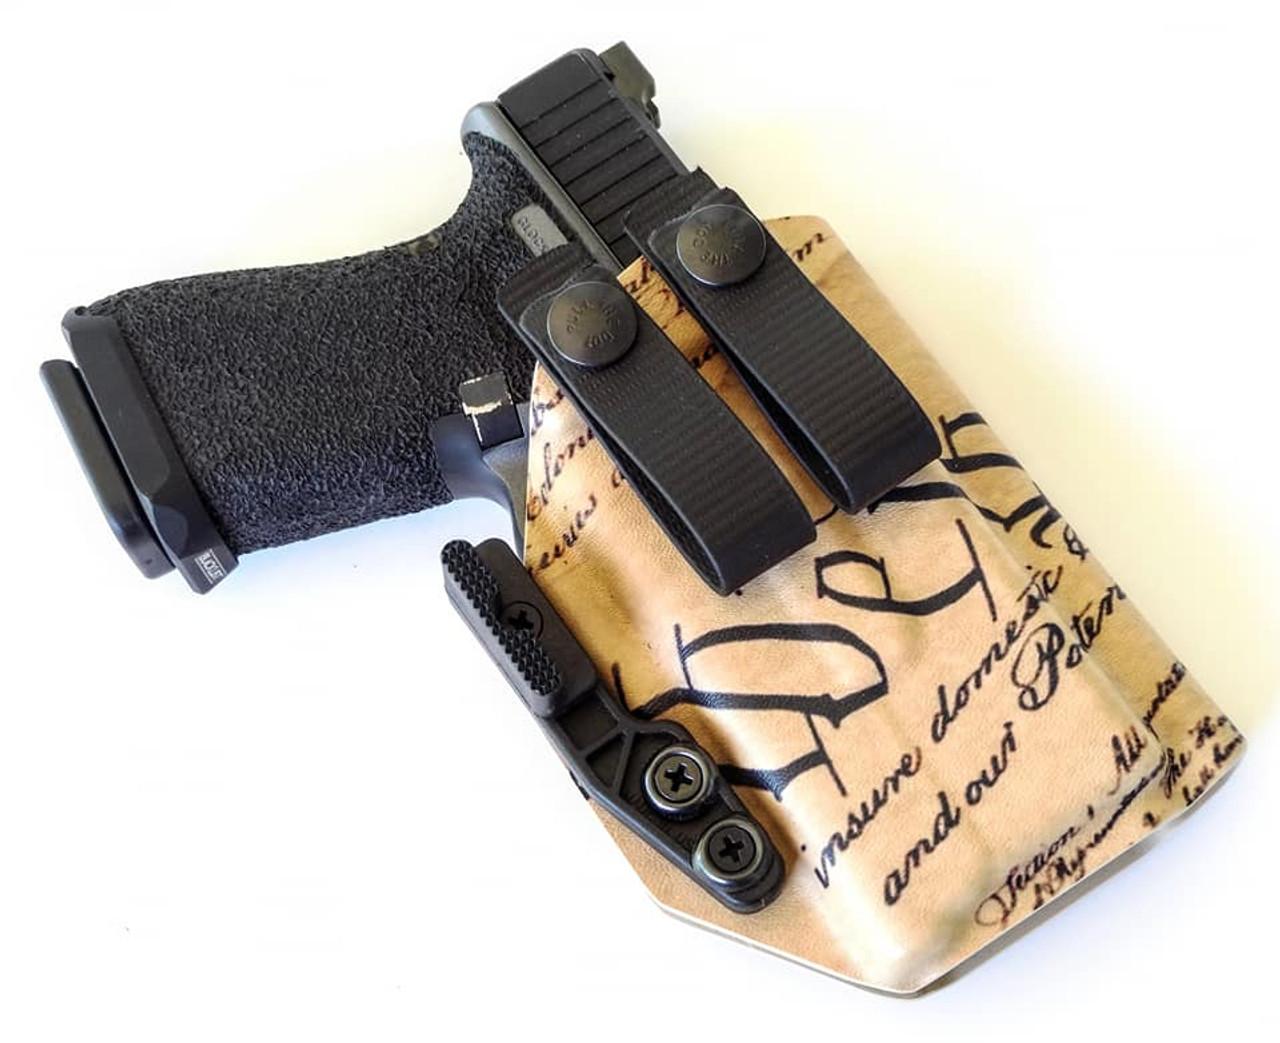 Glock 19 XC1 Appendix Carry Holster